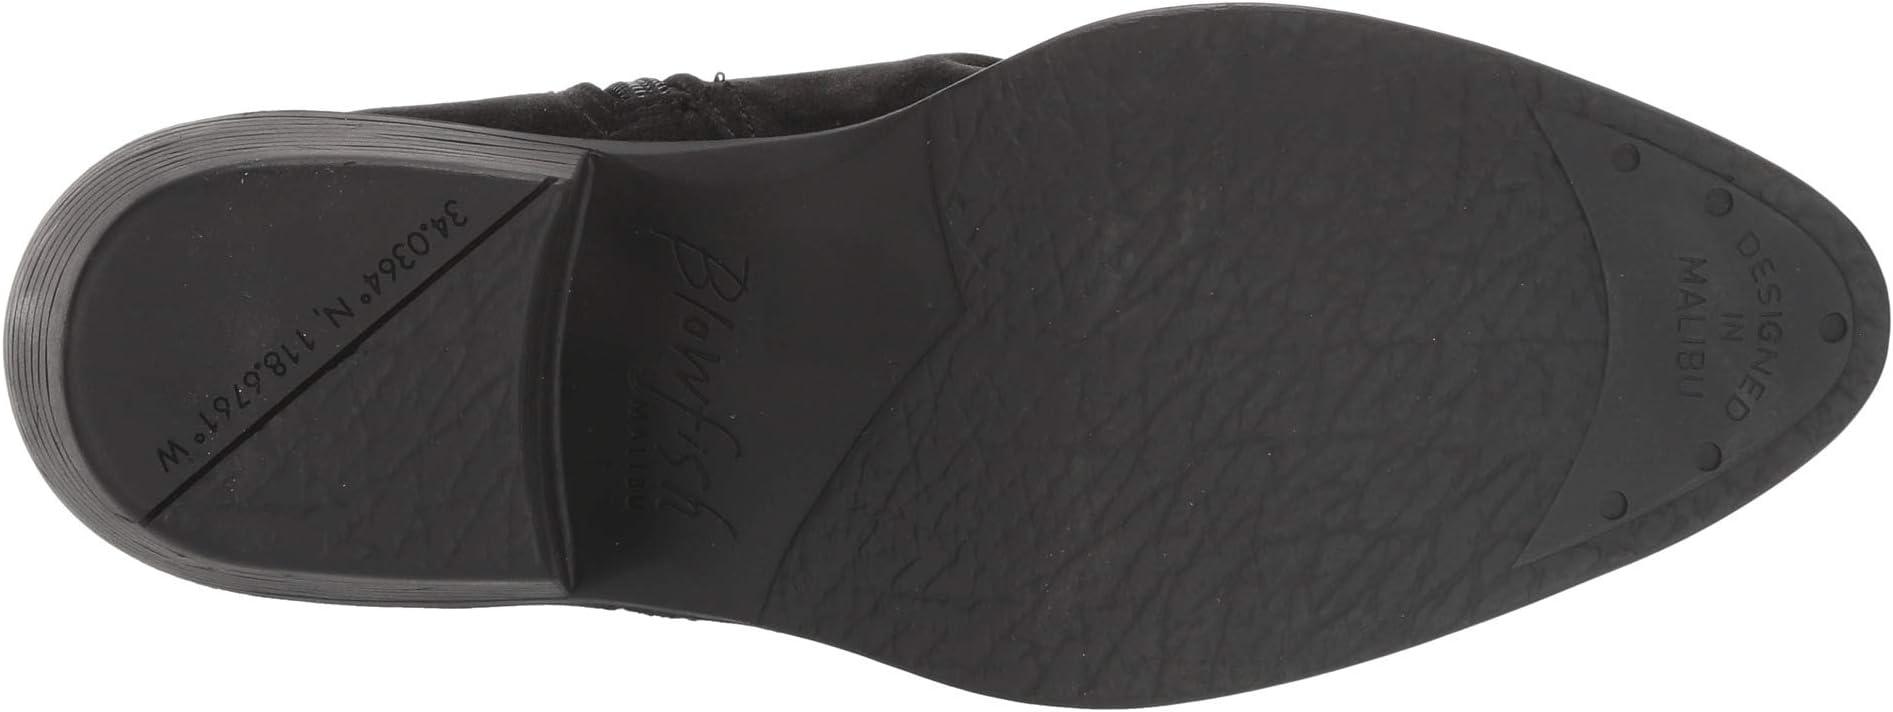 Blowfish Wander   Women's shoes   2020 Newest